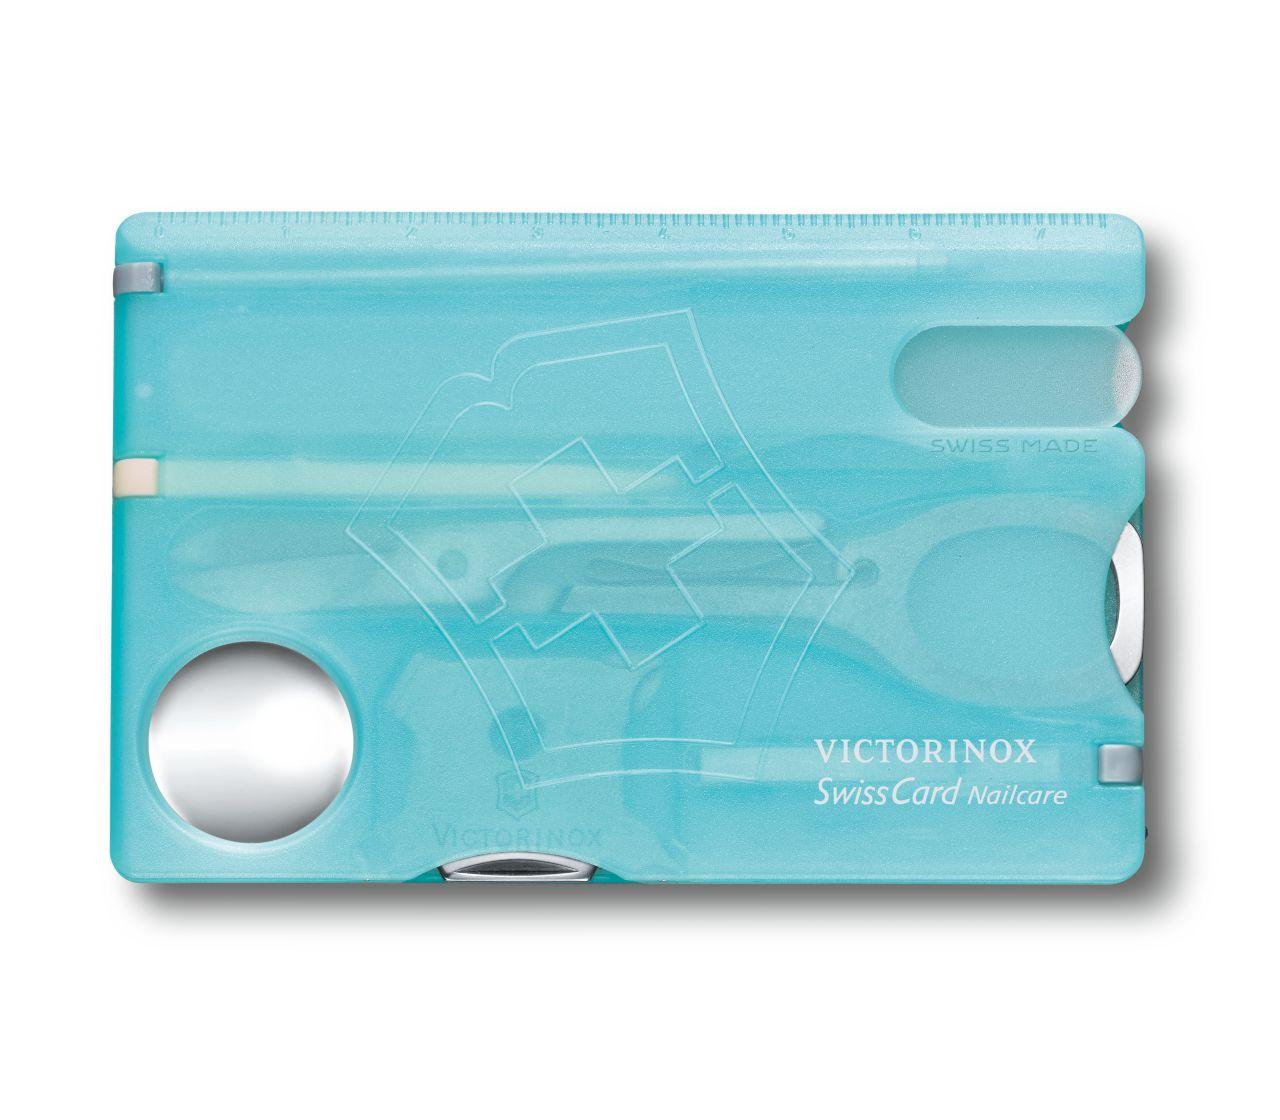 Tarjeta Multiusos Victorinox SwissCard Nailcare Azul Hielo  con lima de uñas de cristal 0.7240.T21